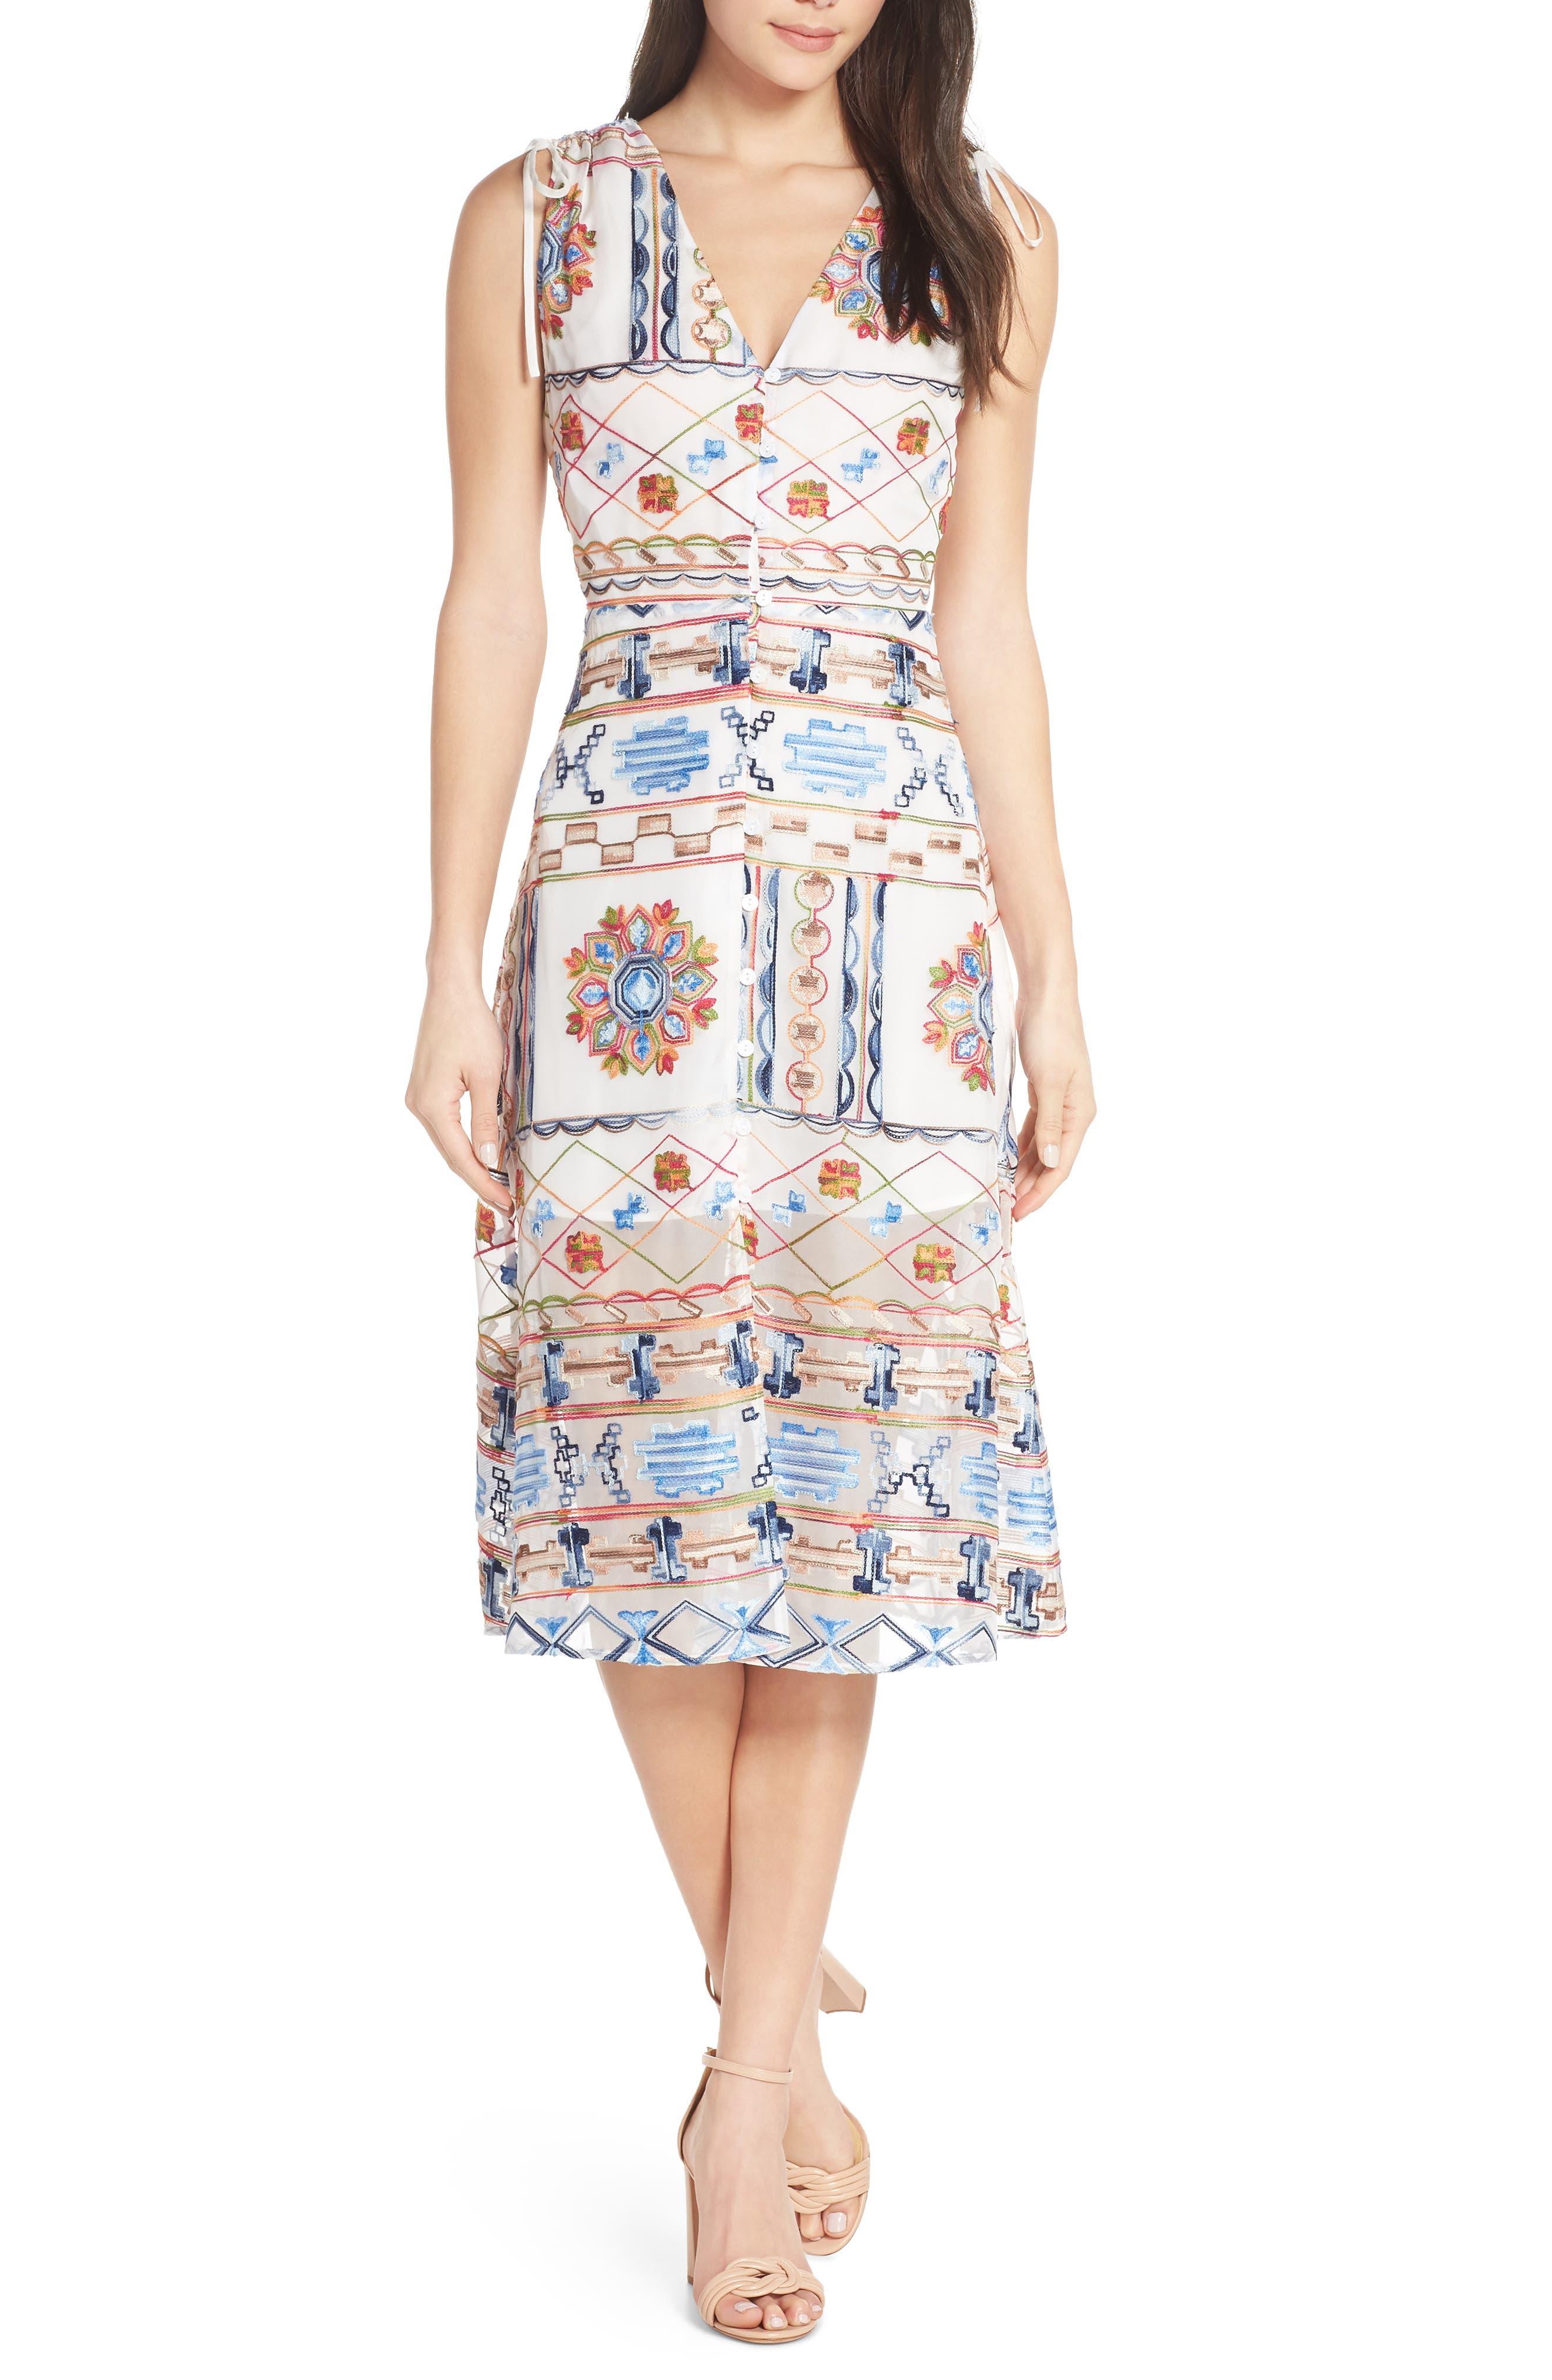 Ali & Jay La Cita Embroidered Chiffon Midi Dress, White